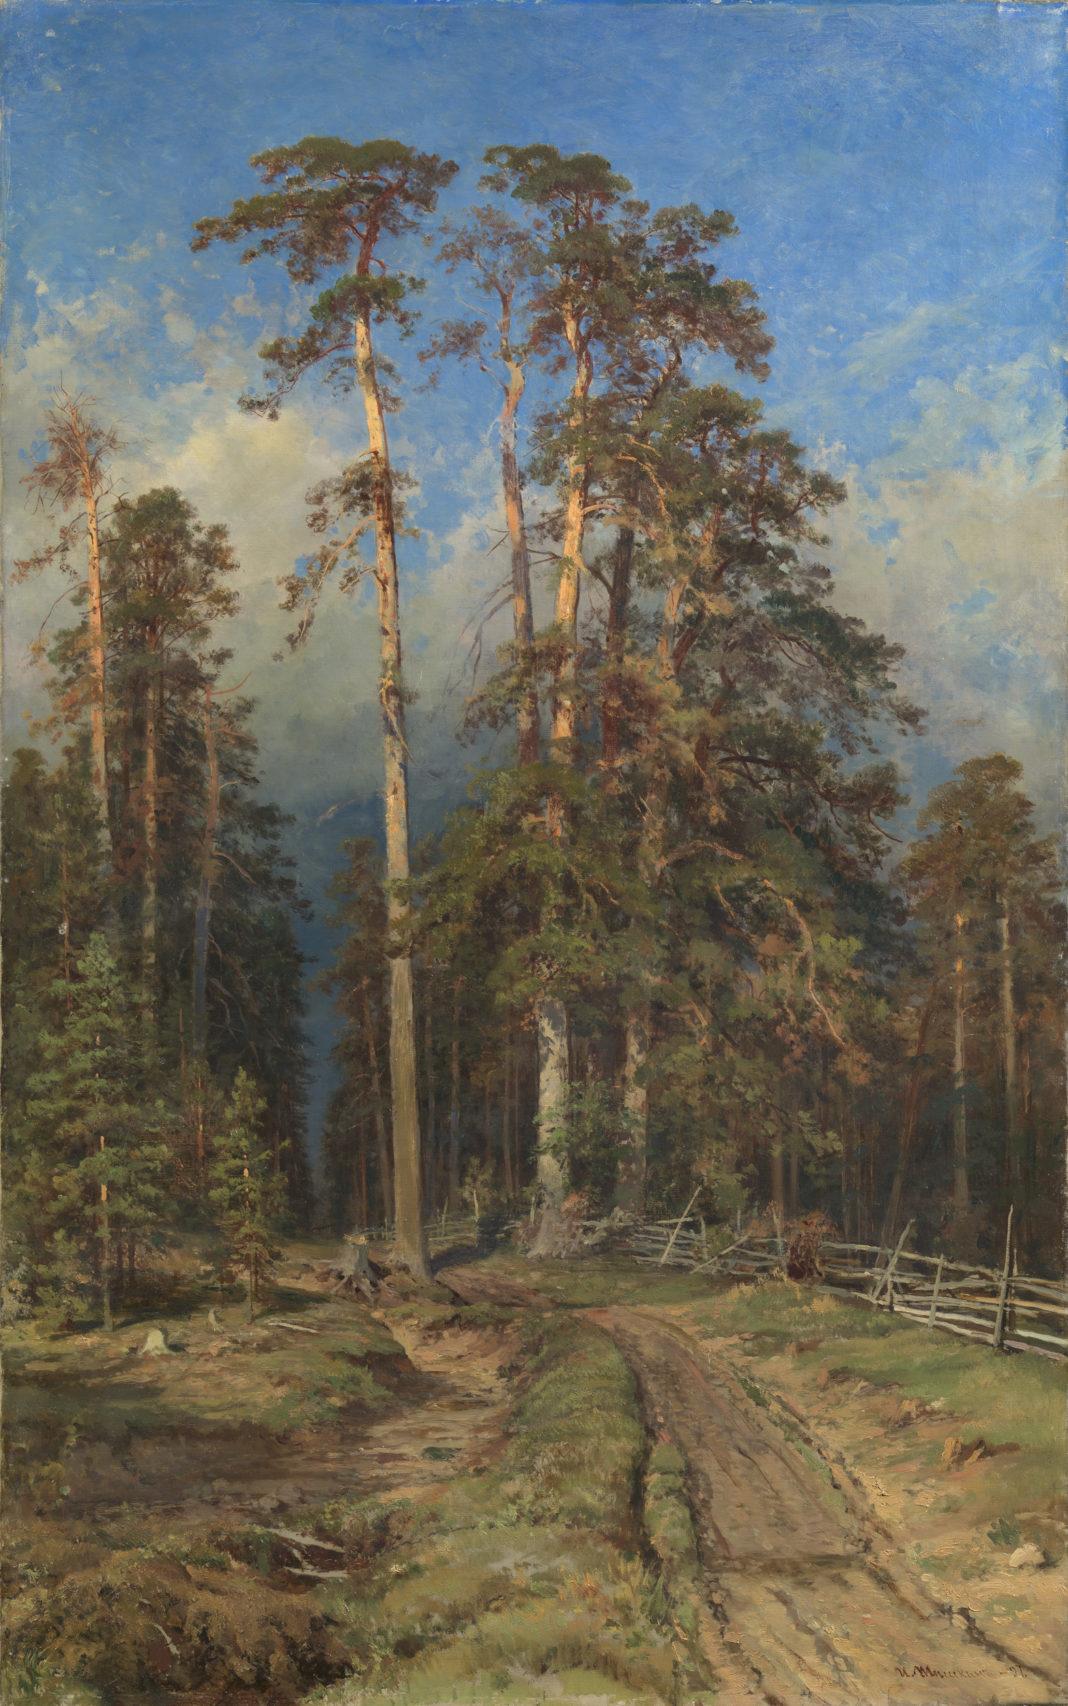 Lot 11. Ivan Shishkin, Pine Forest. Yelabuga, 1897. 800,000-1,200,000 GBP